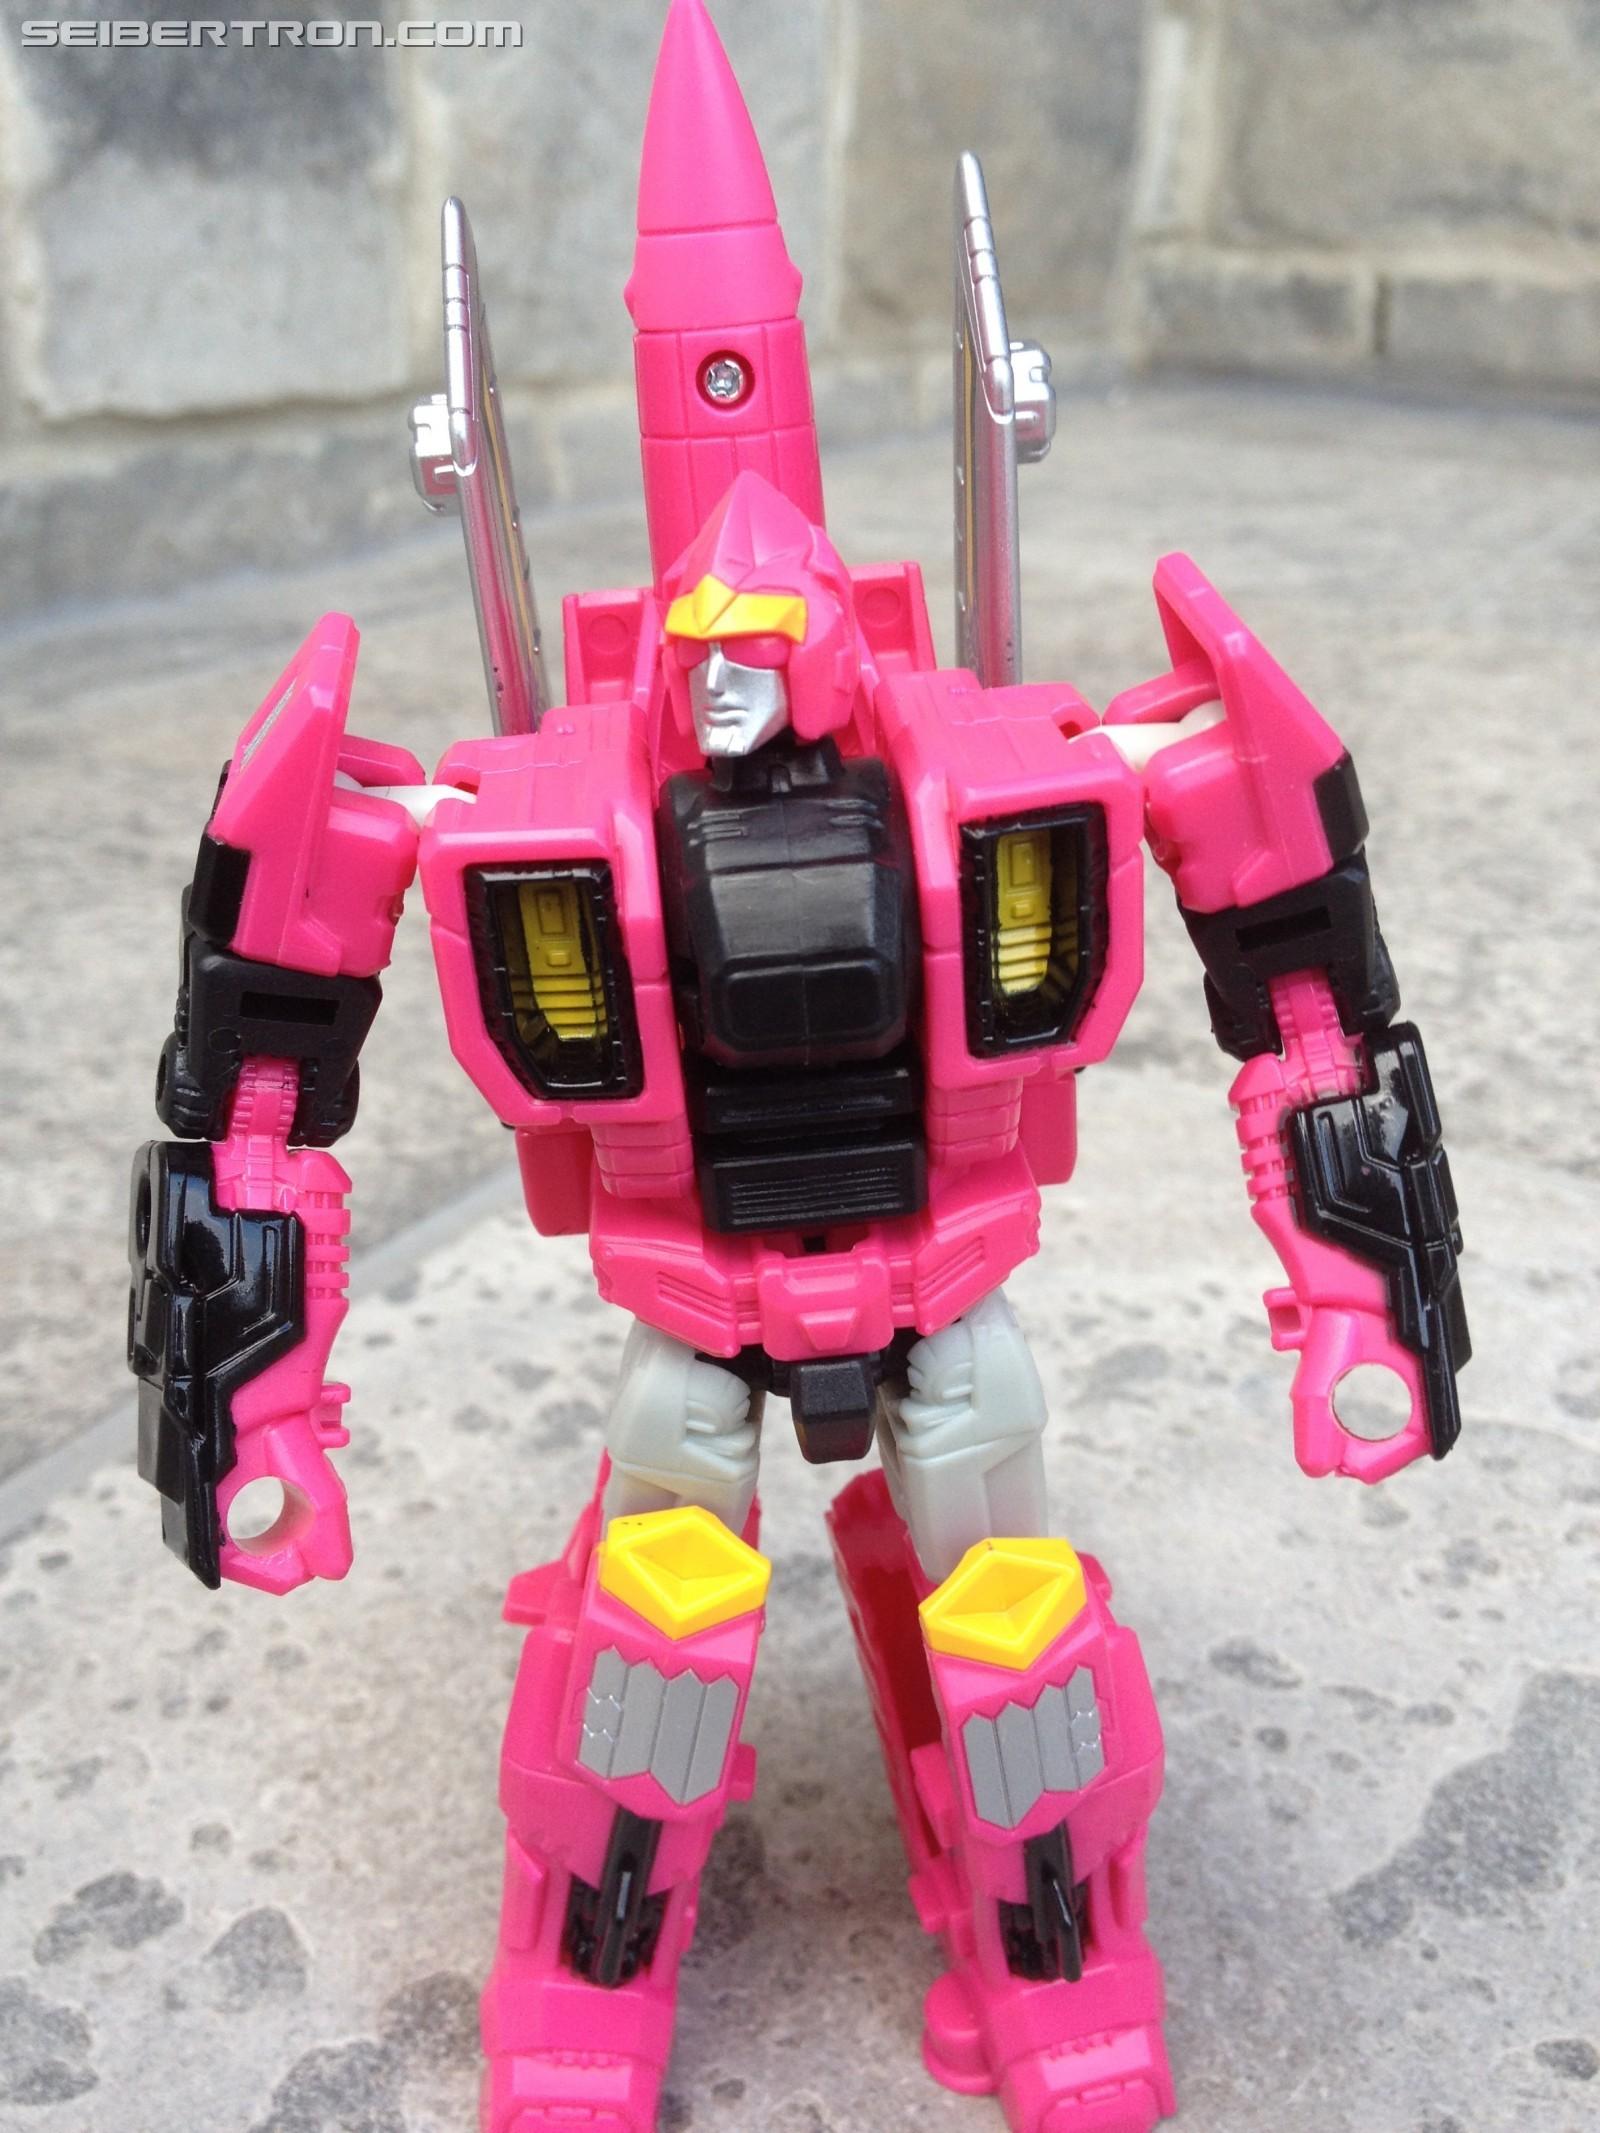 Transformers News: Top 5 Best Combiner Components (Limbs / Torsos) from Transformers Combiner Wars and Unite Warriors